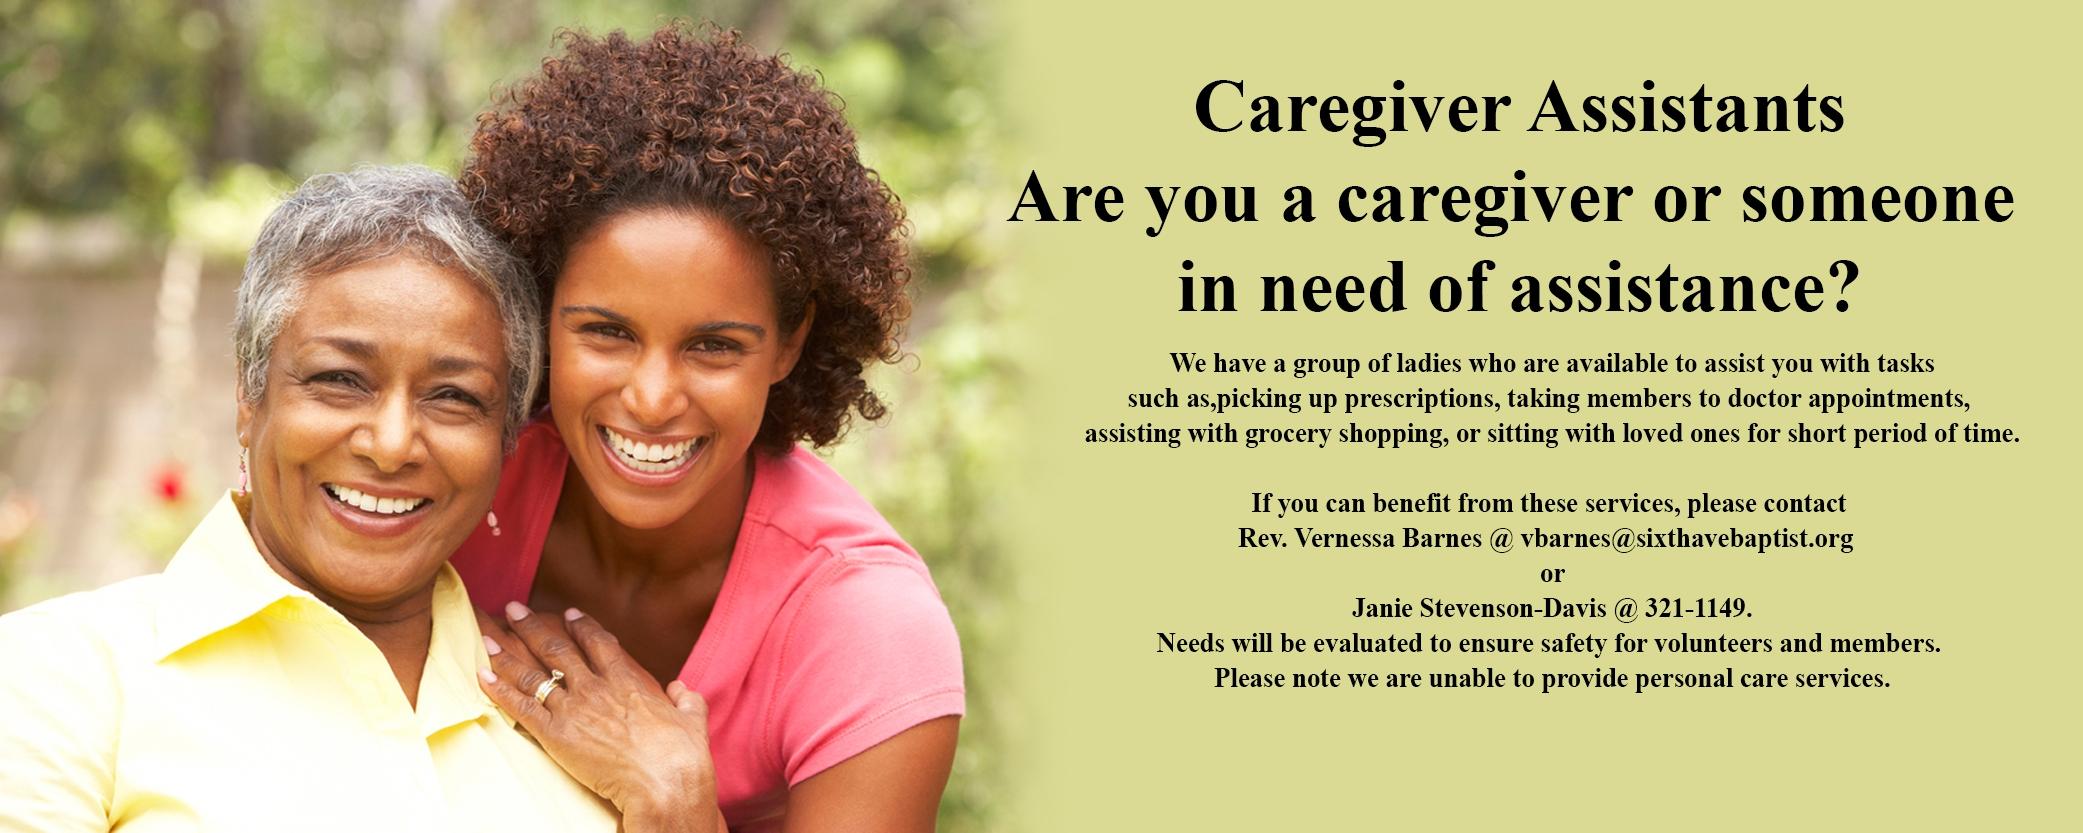 SABC_caregiver